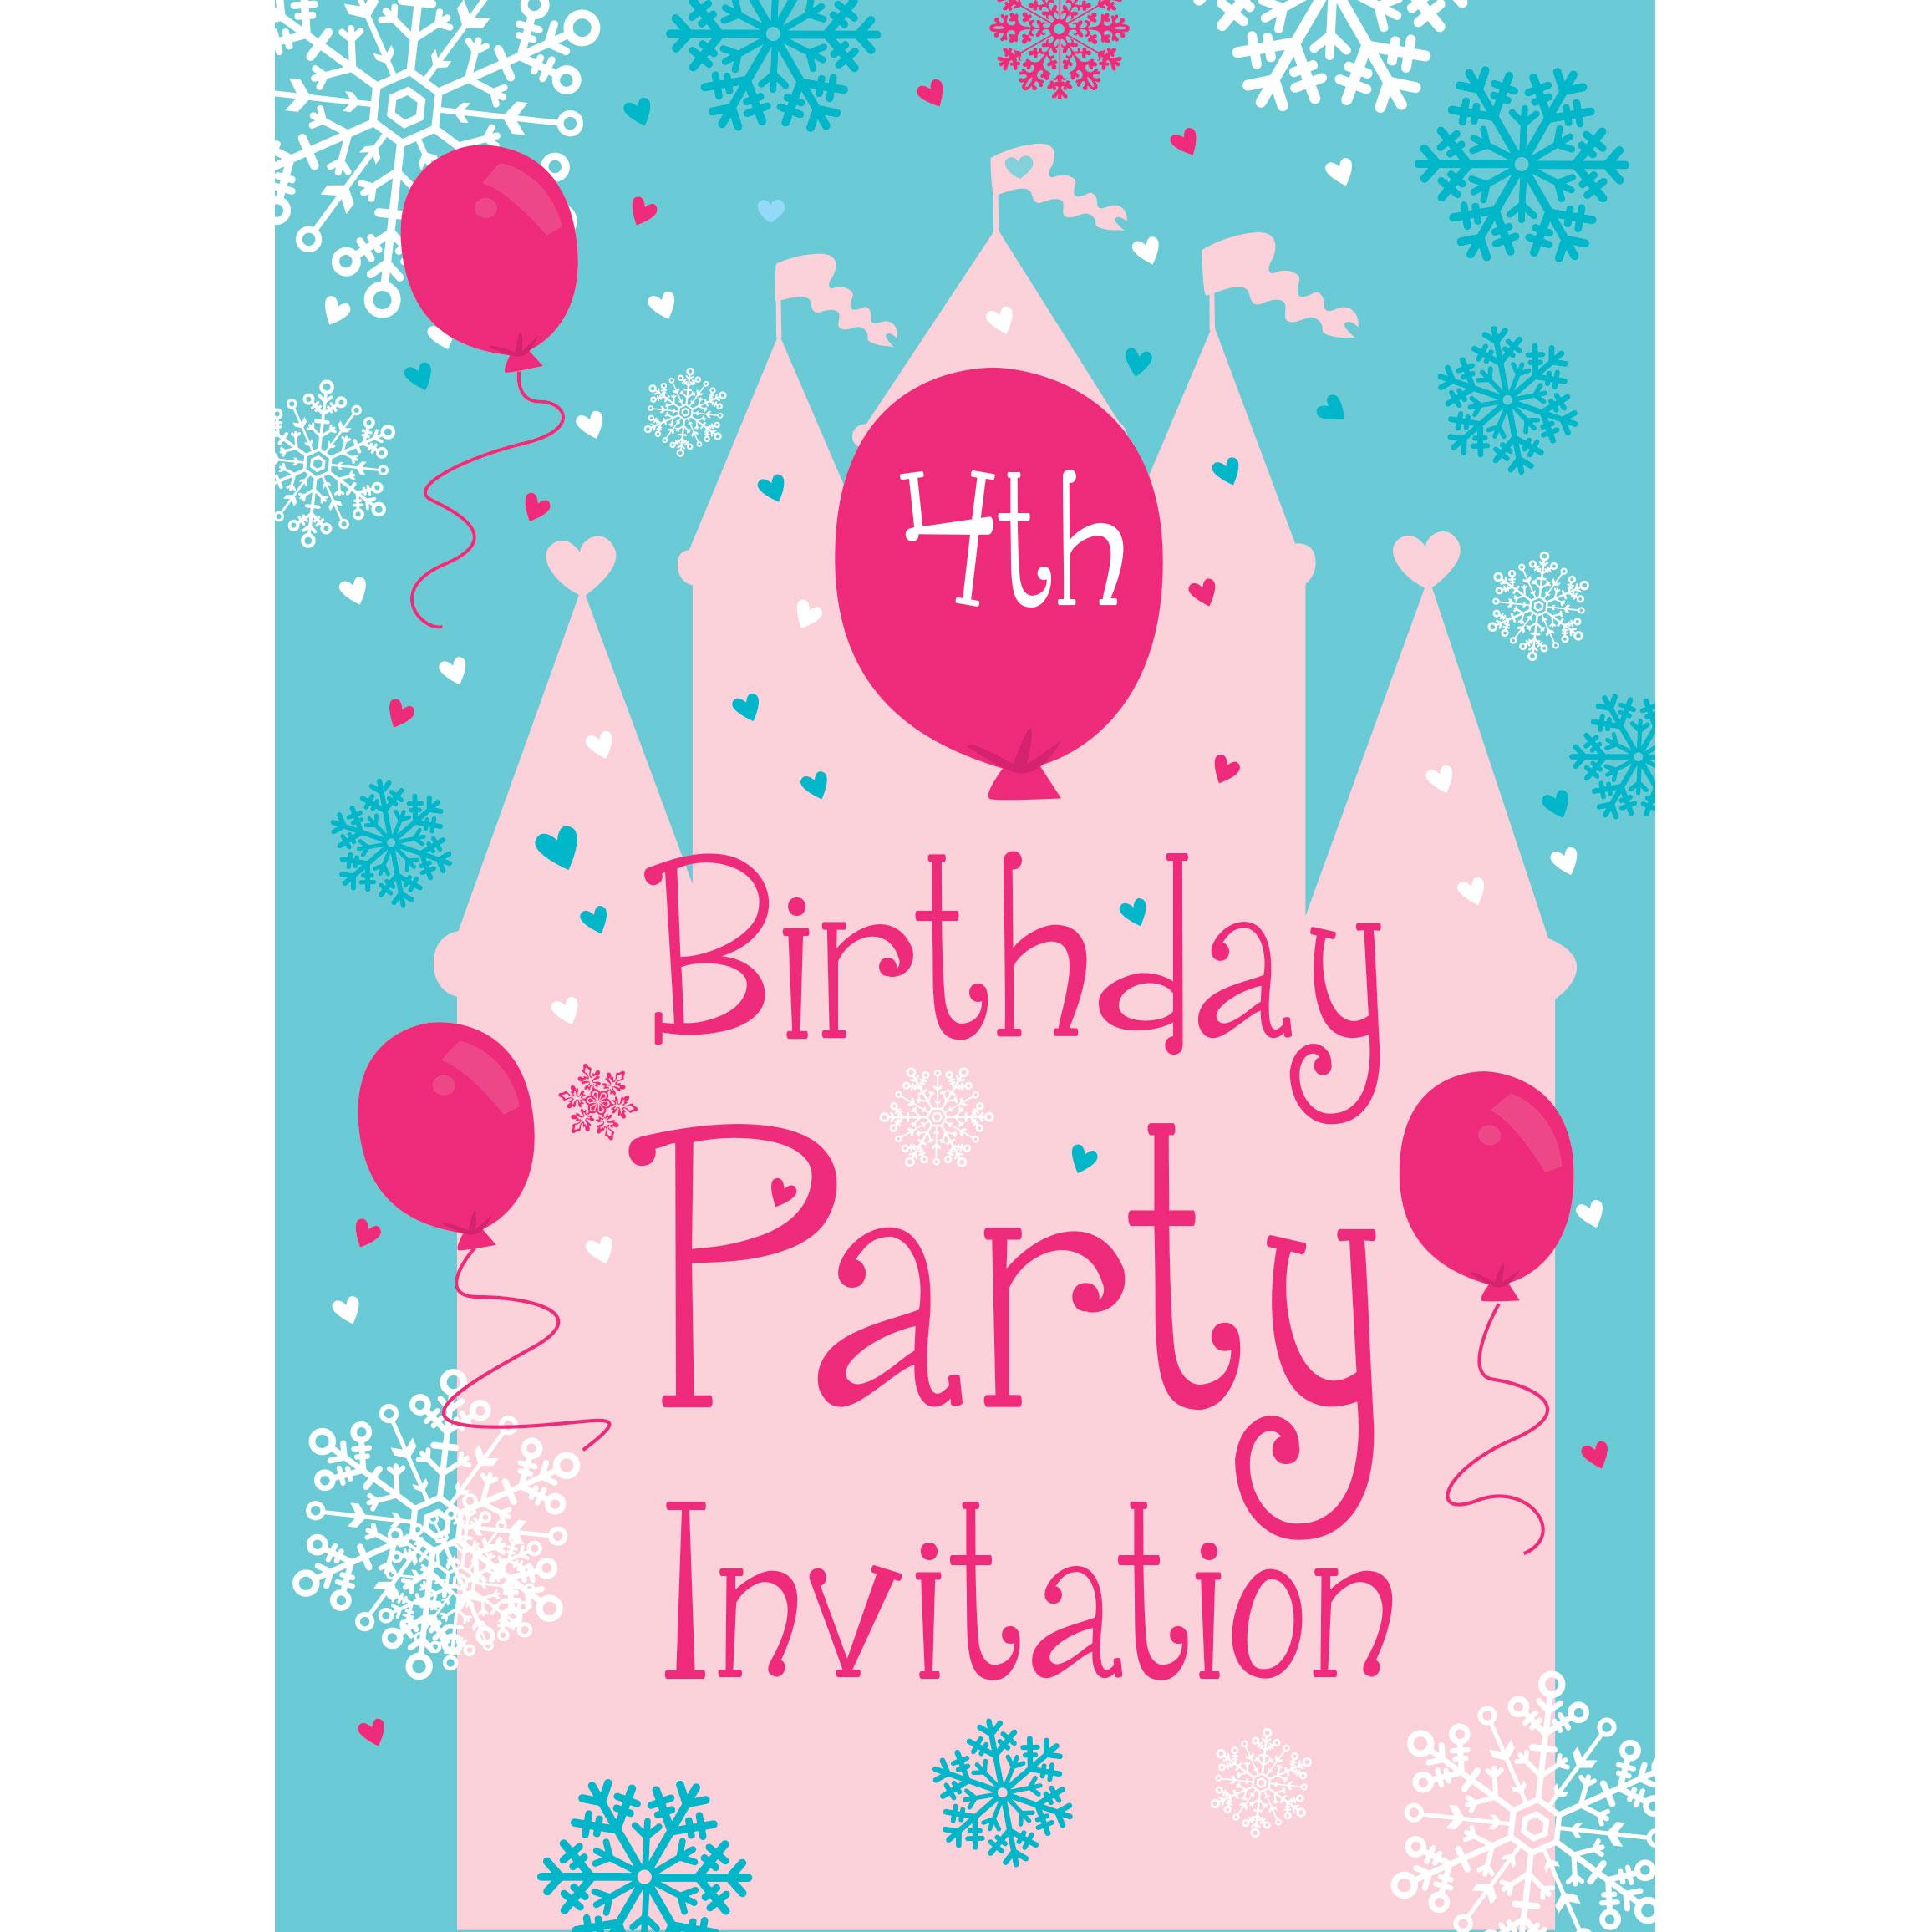 Disney Princess Party Invitations was amazing invitations layout